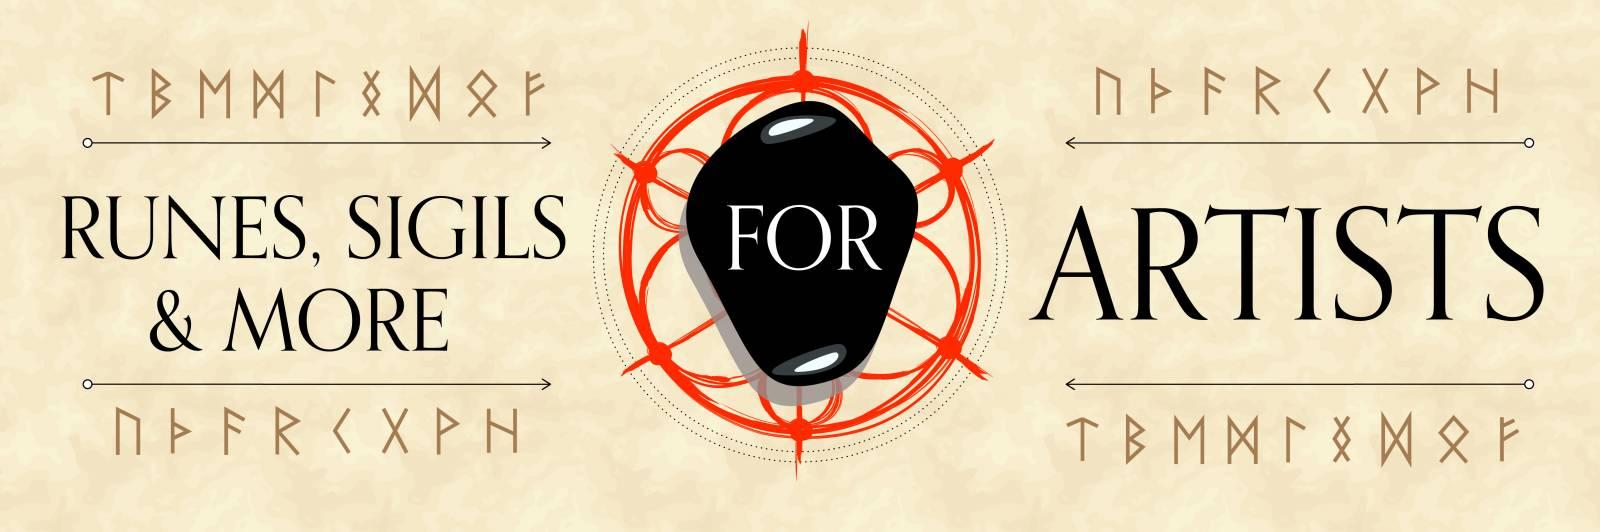 Magic for Artists Part 3: Runes, Sigils & More | Muddy Colors